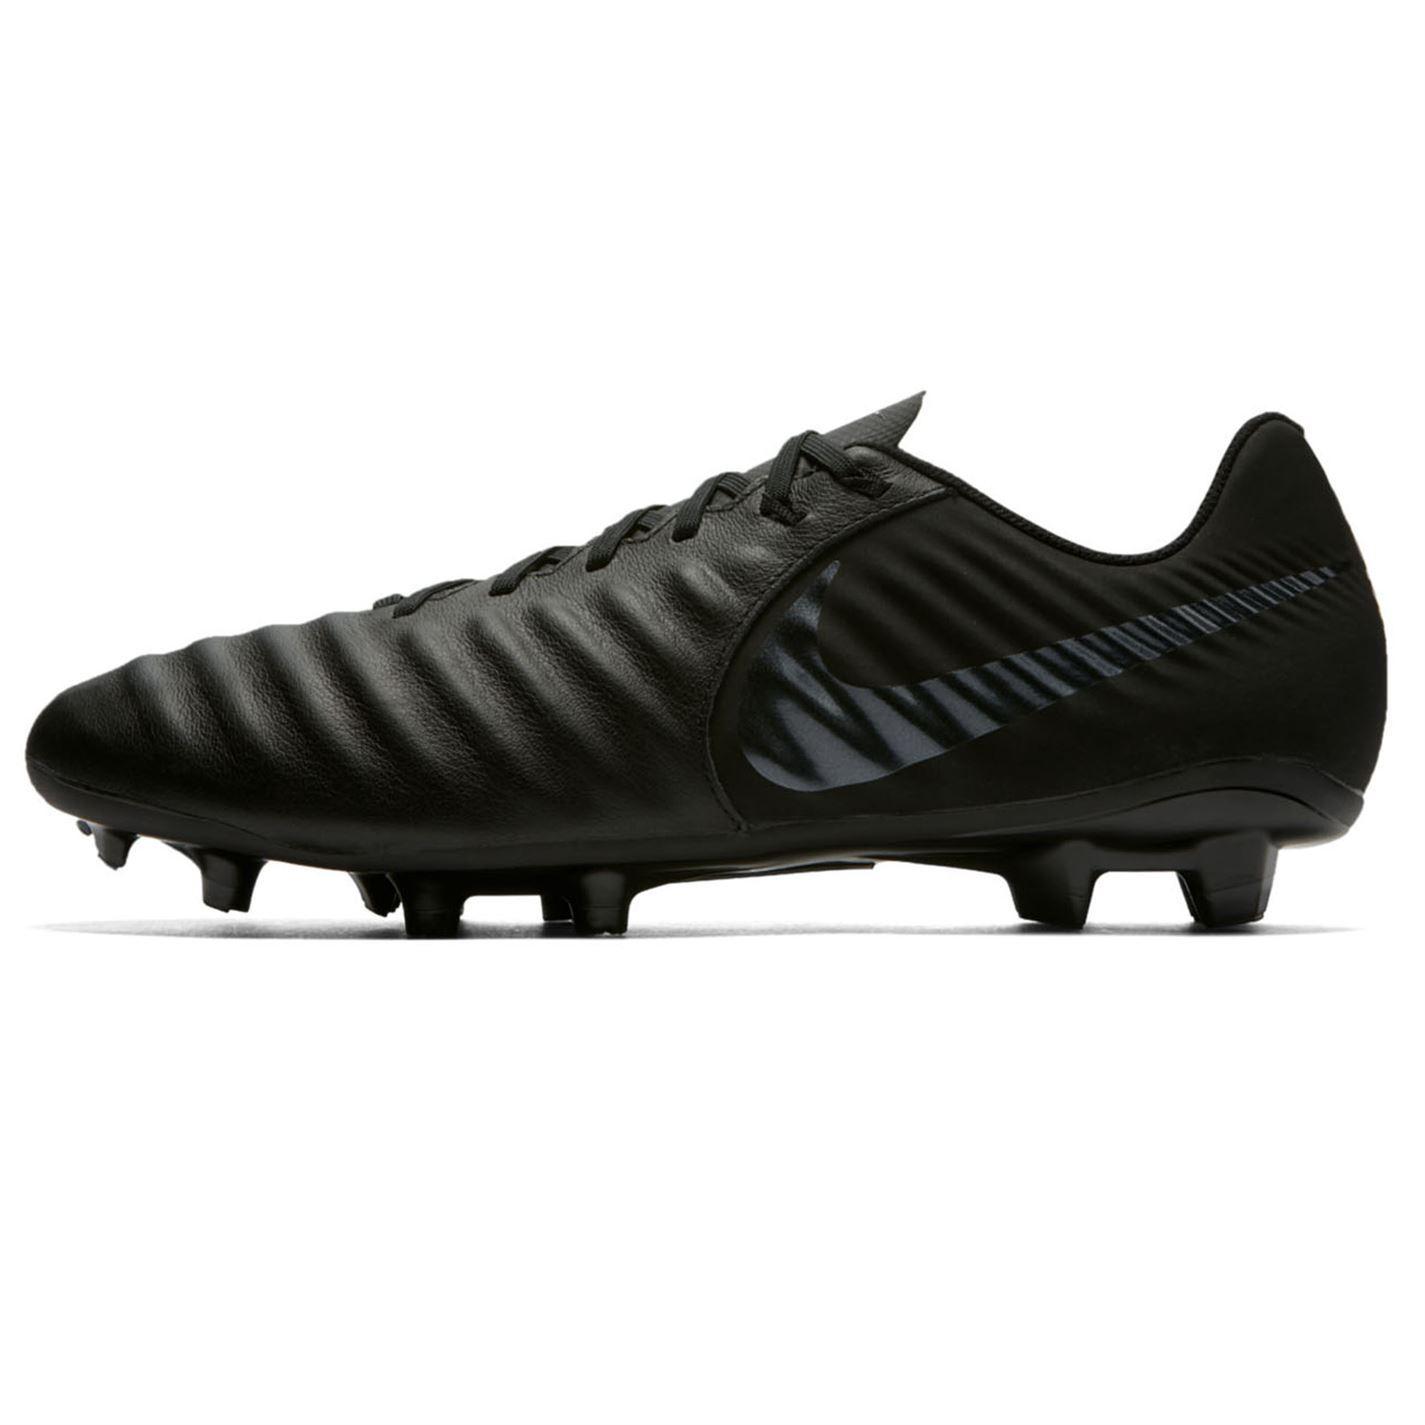 Nike-Tiempo-Legend-Academy-FG-Firm-Ground-Chaussures-De-Football-Homme-Football-Chaussures-Crampons miniature 5